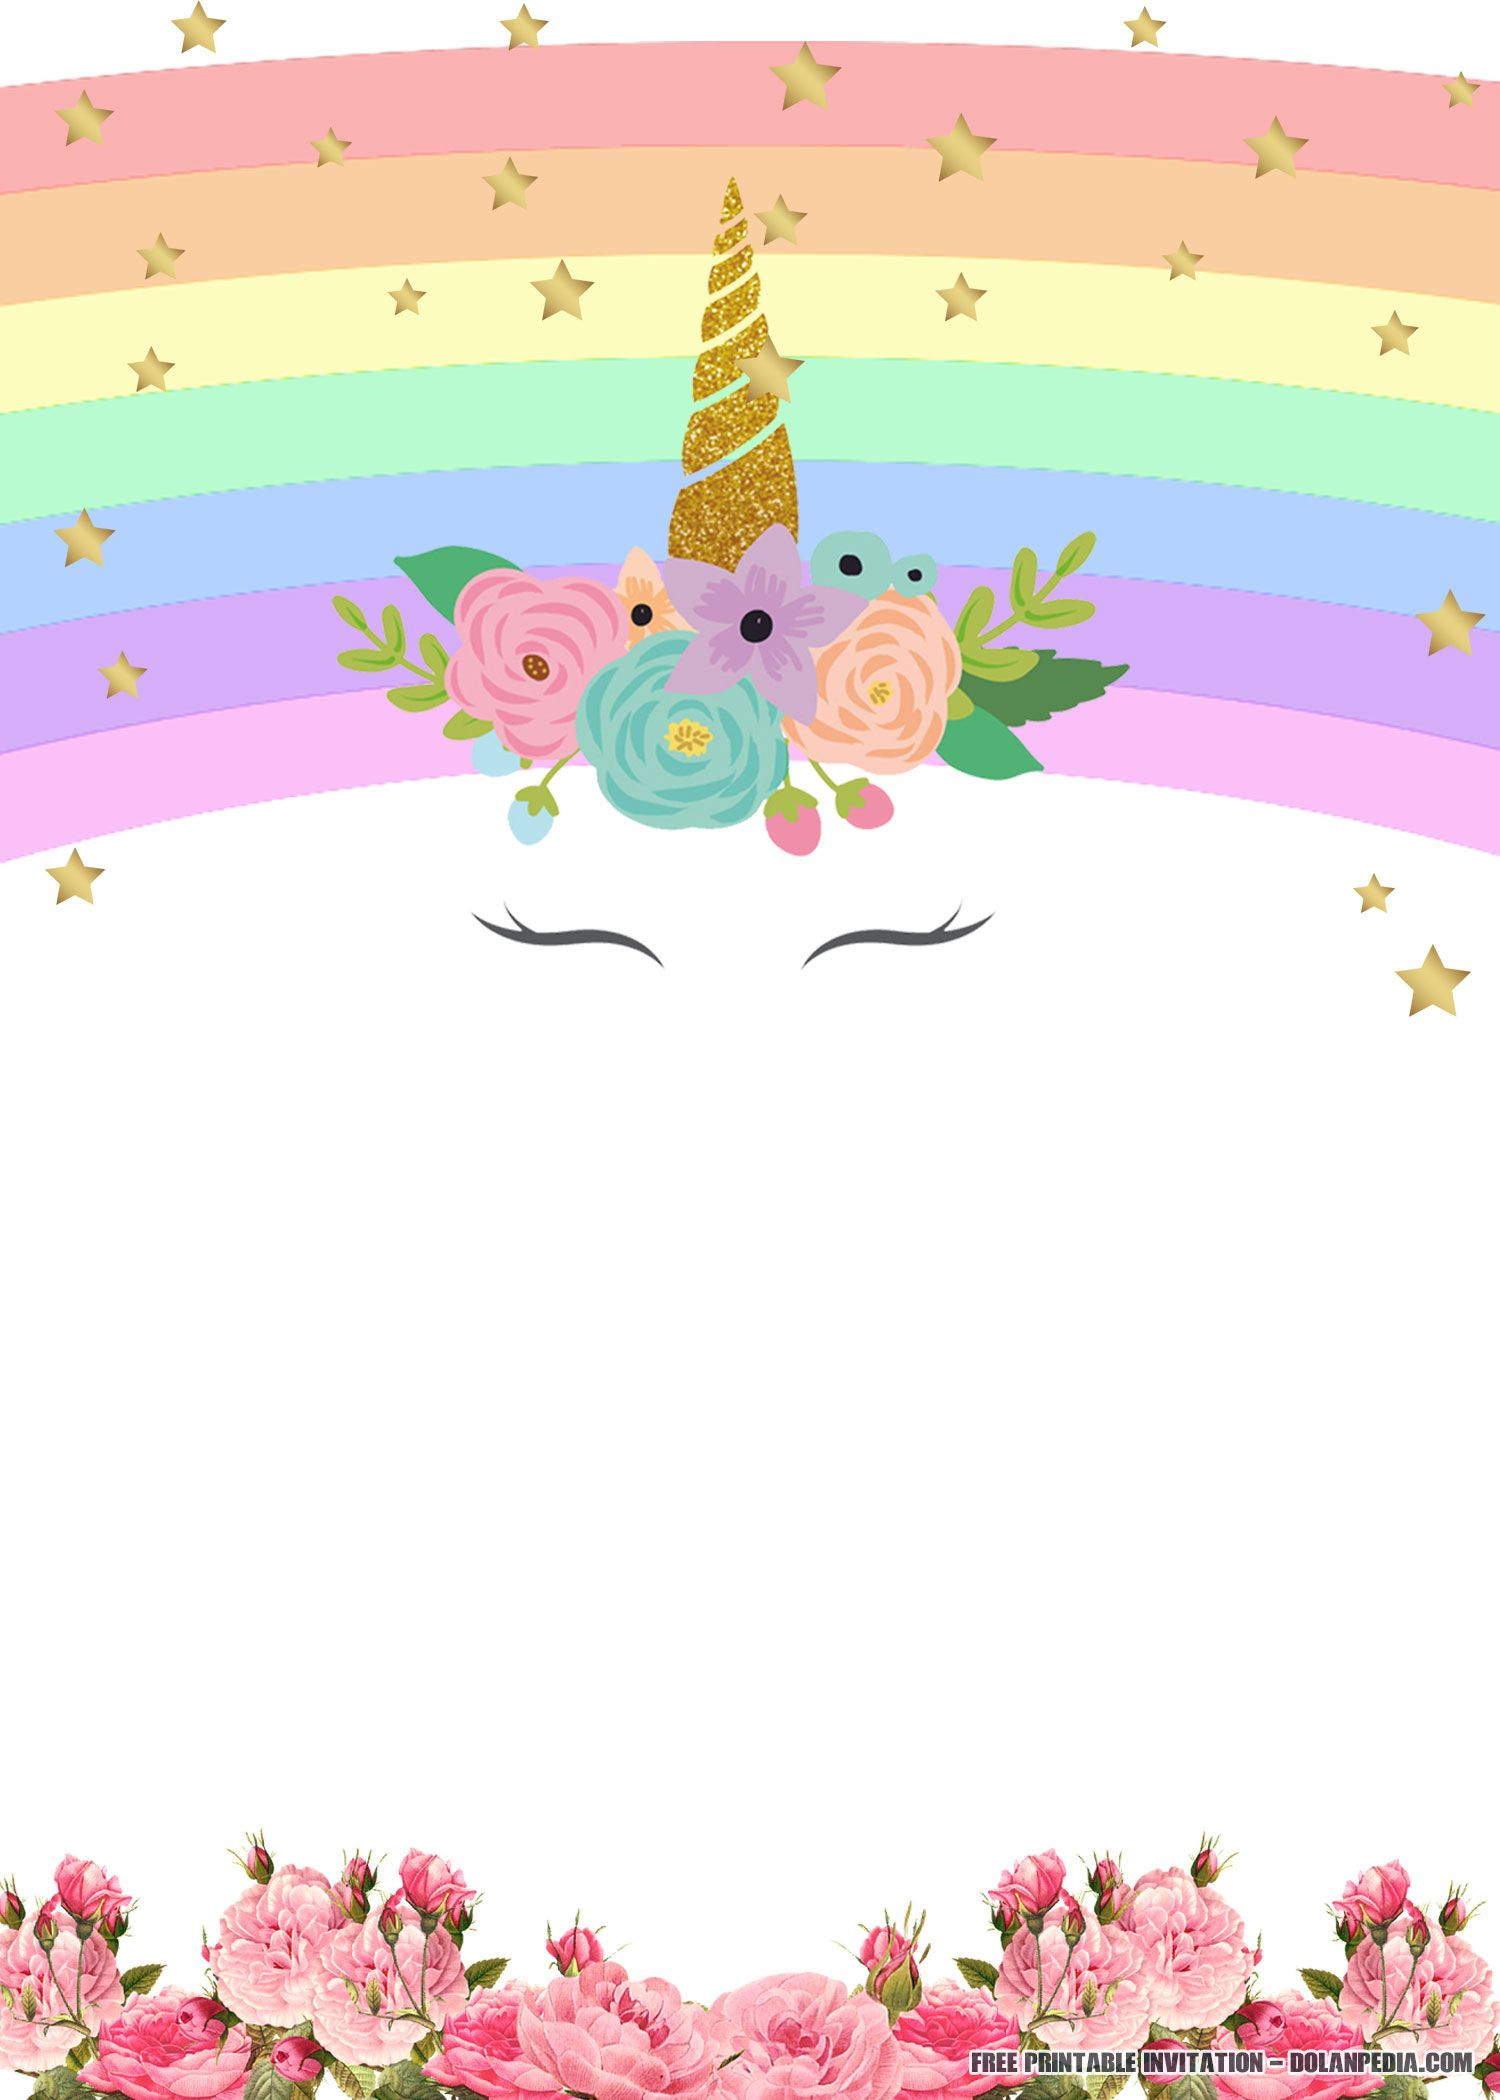 Best ideas about Free Printable Unicorn Birthday Invitations . Save or Pin FREE Printable Unicorn Rainbow Invitation Now.